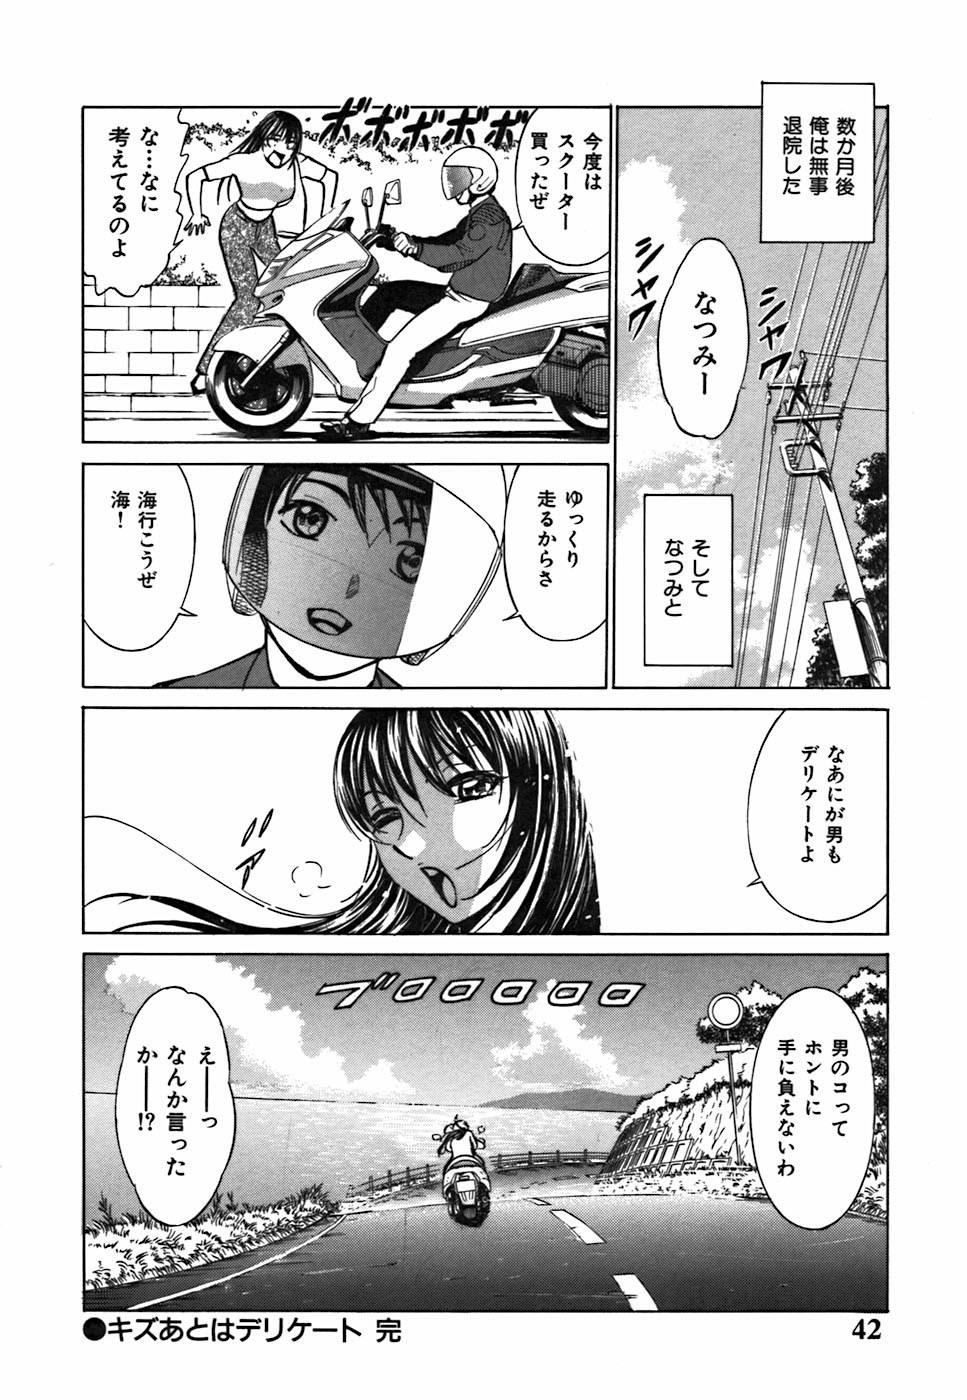 Kimi ga Nozomu Katachi | Appearance for which you hope 41